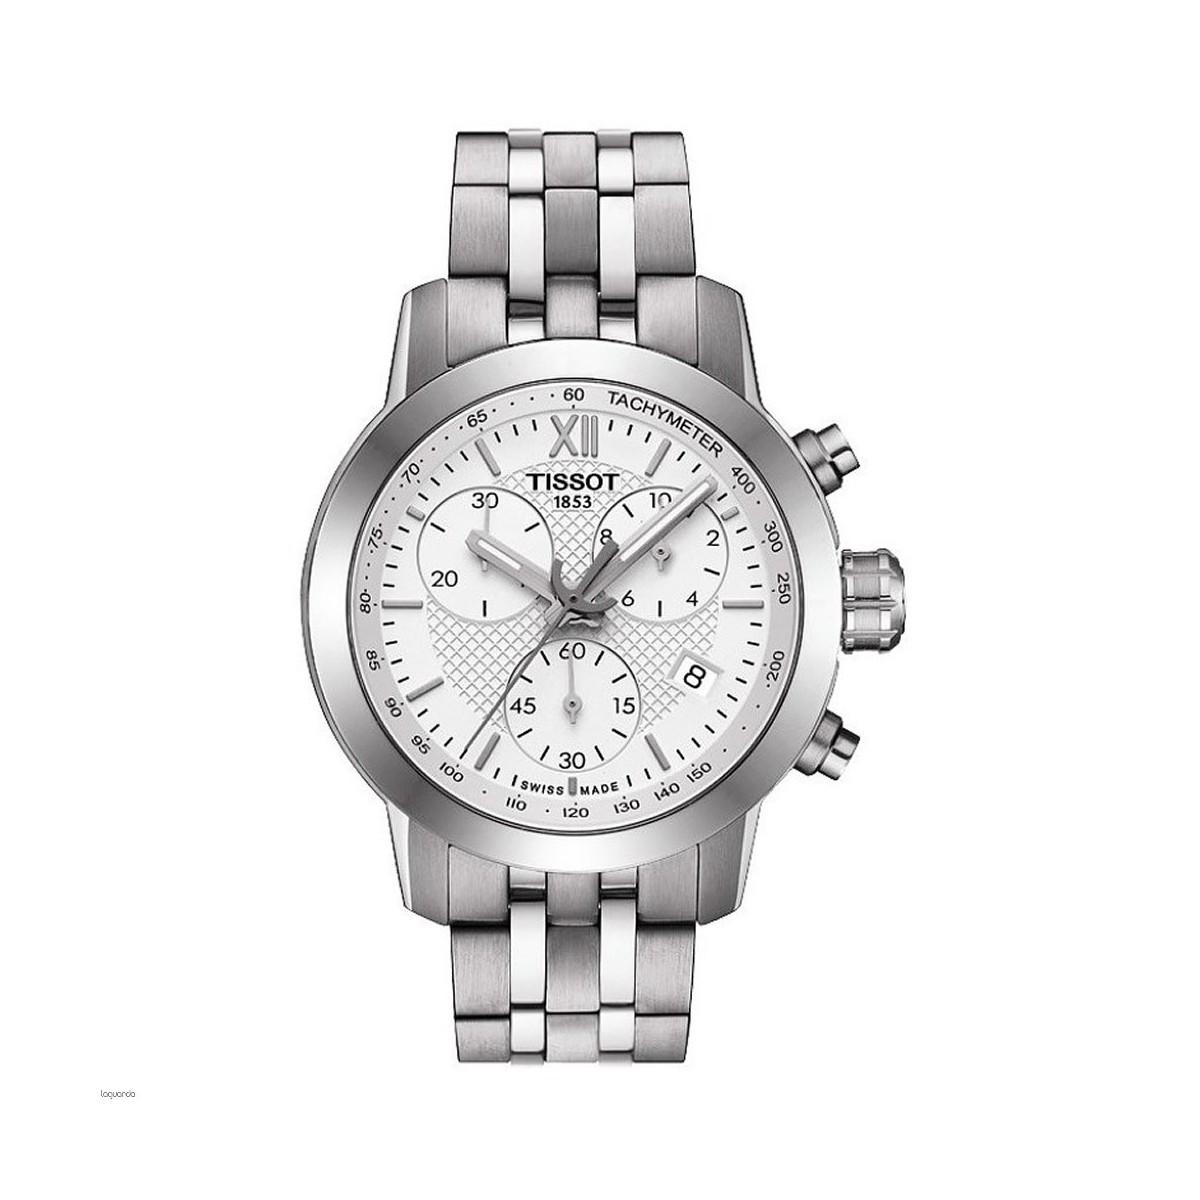 https://www.gaberjoyeria.com/4478-thickbox_default/reloj-tissot.jpg